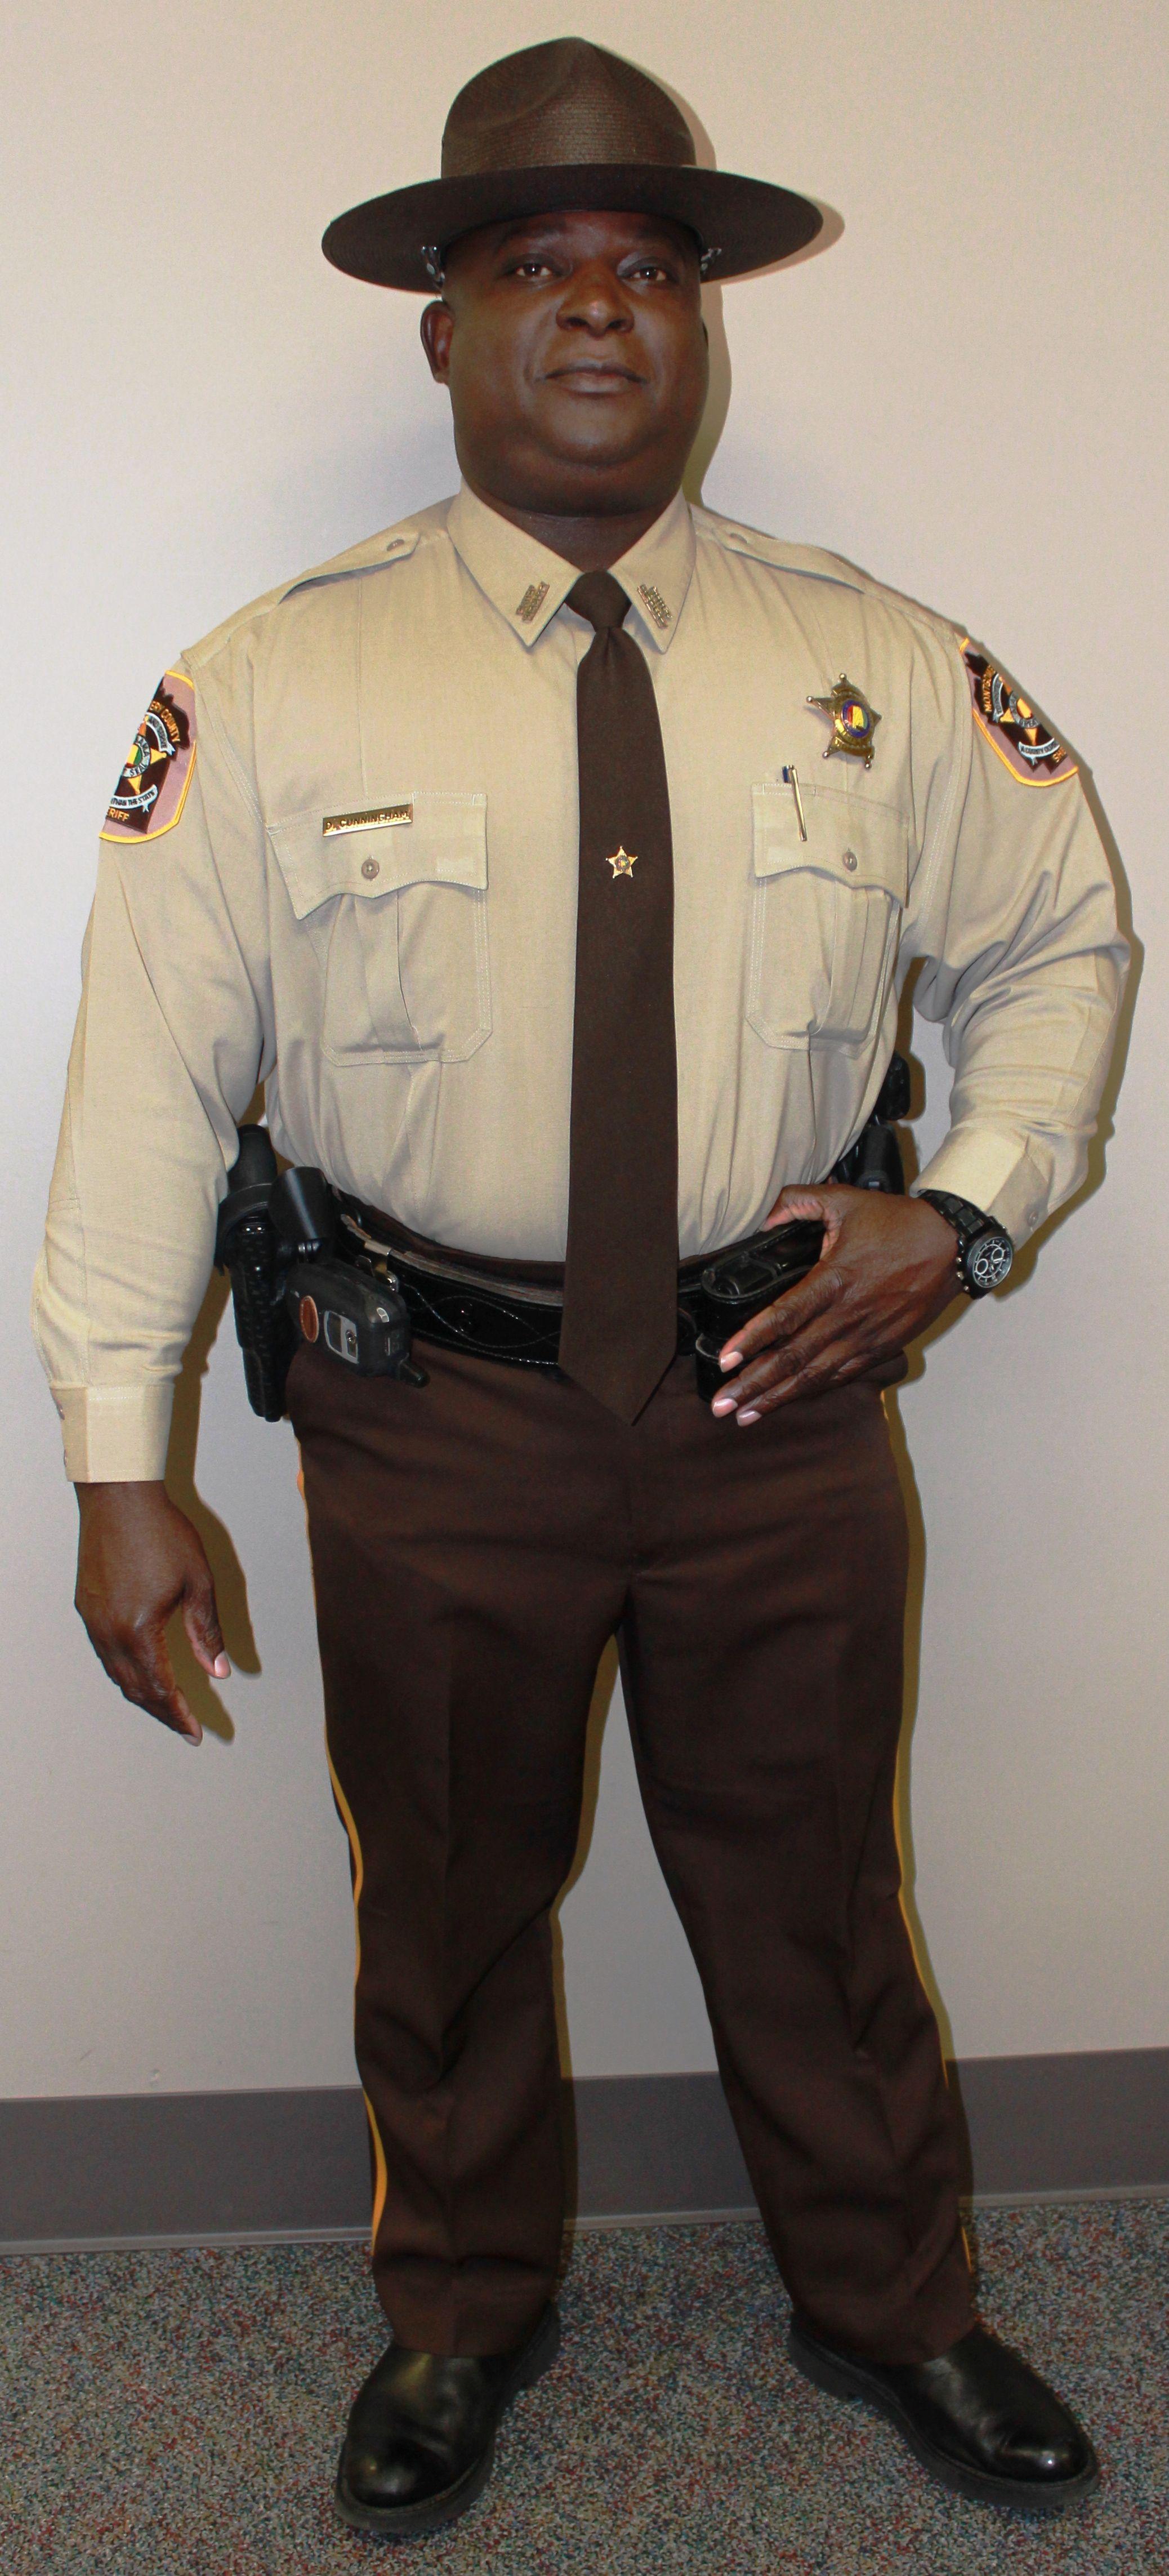 Chief in full uniform. | Sheriff 2014 | Pinterest